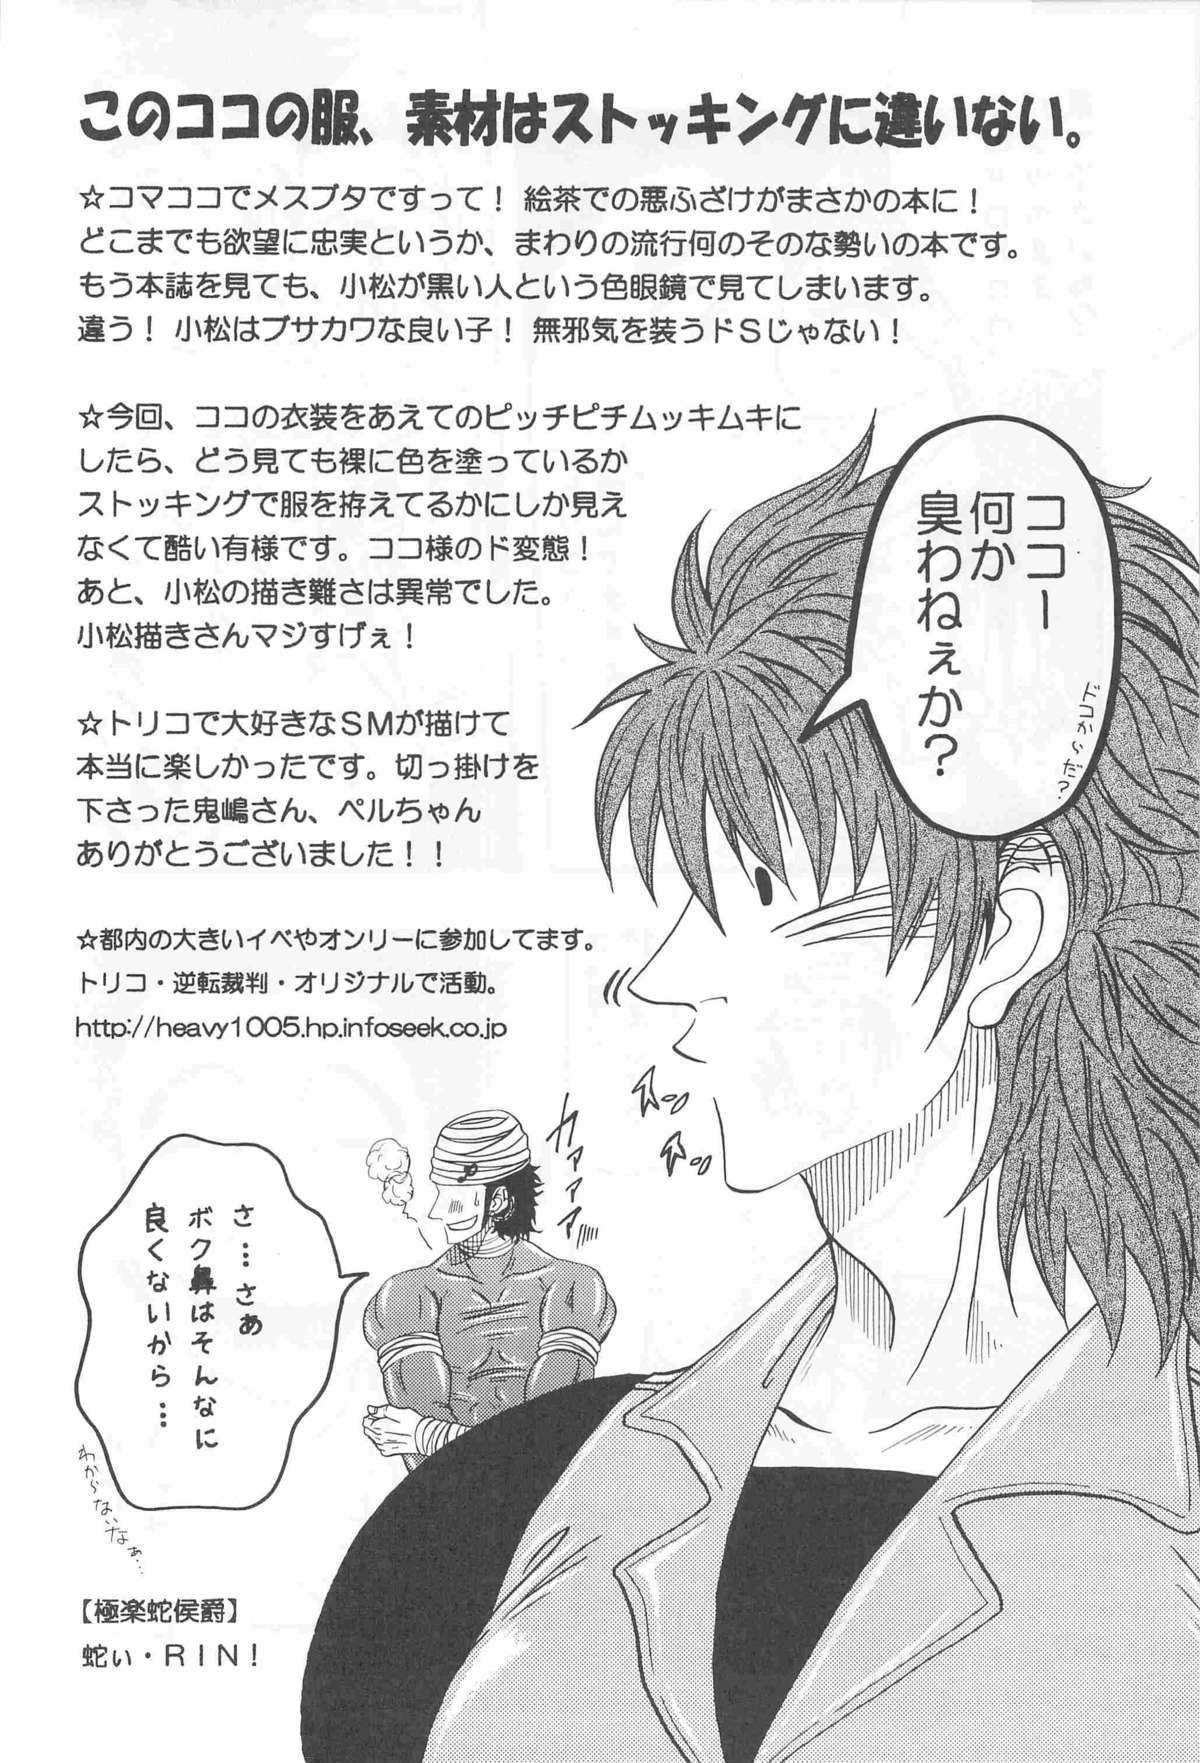 [Kijima Hyougo,Jun'ai Meringue-don,RIN!] [msbt] (Toriko) 23